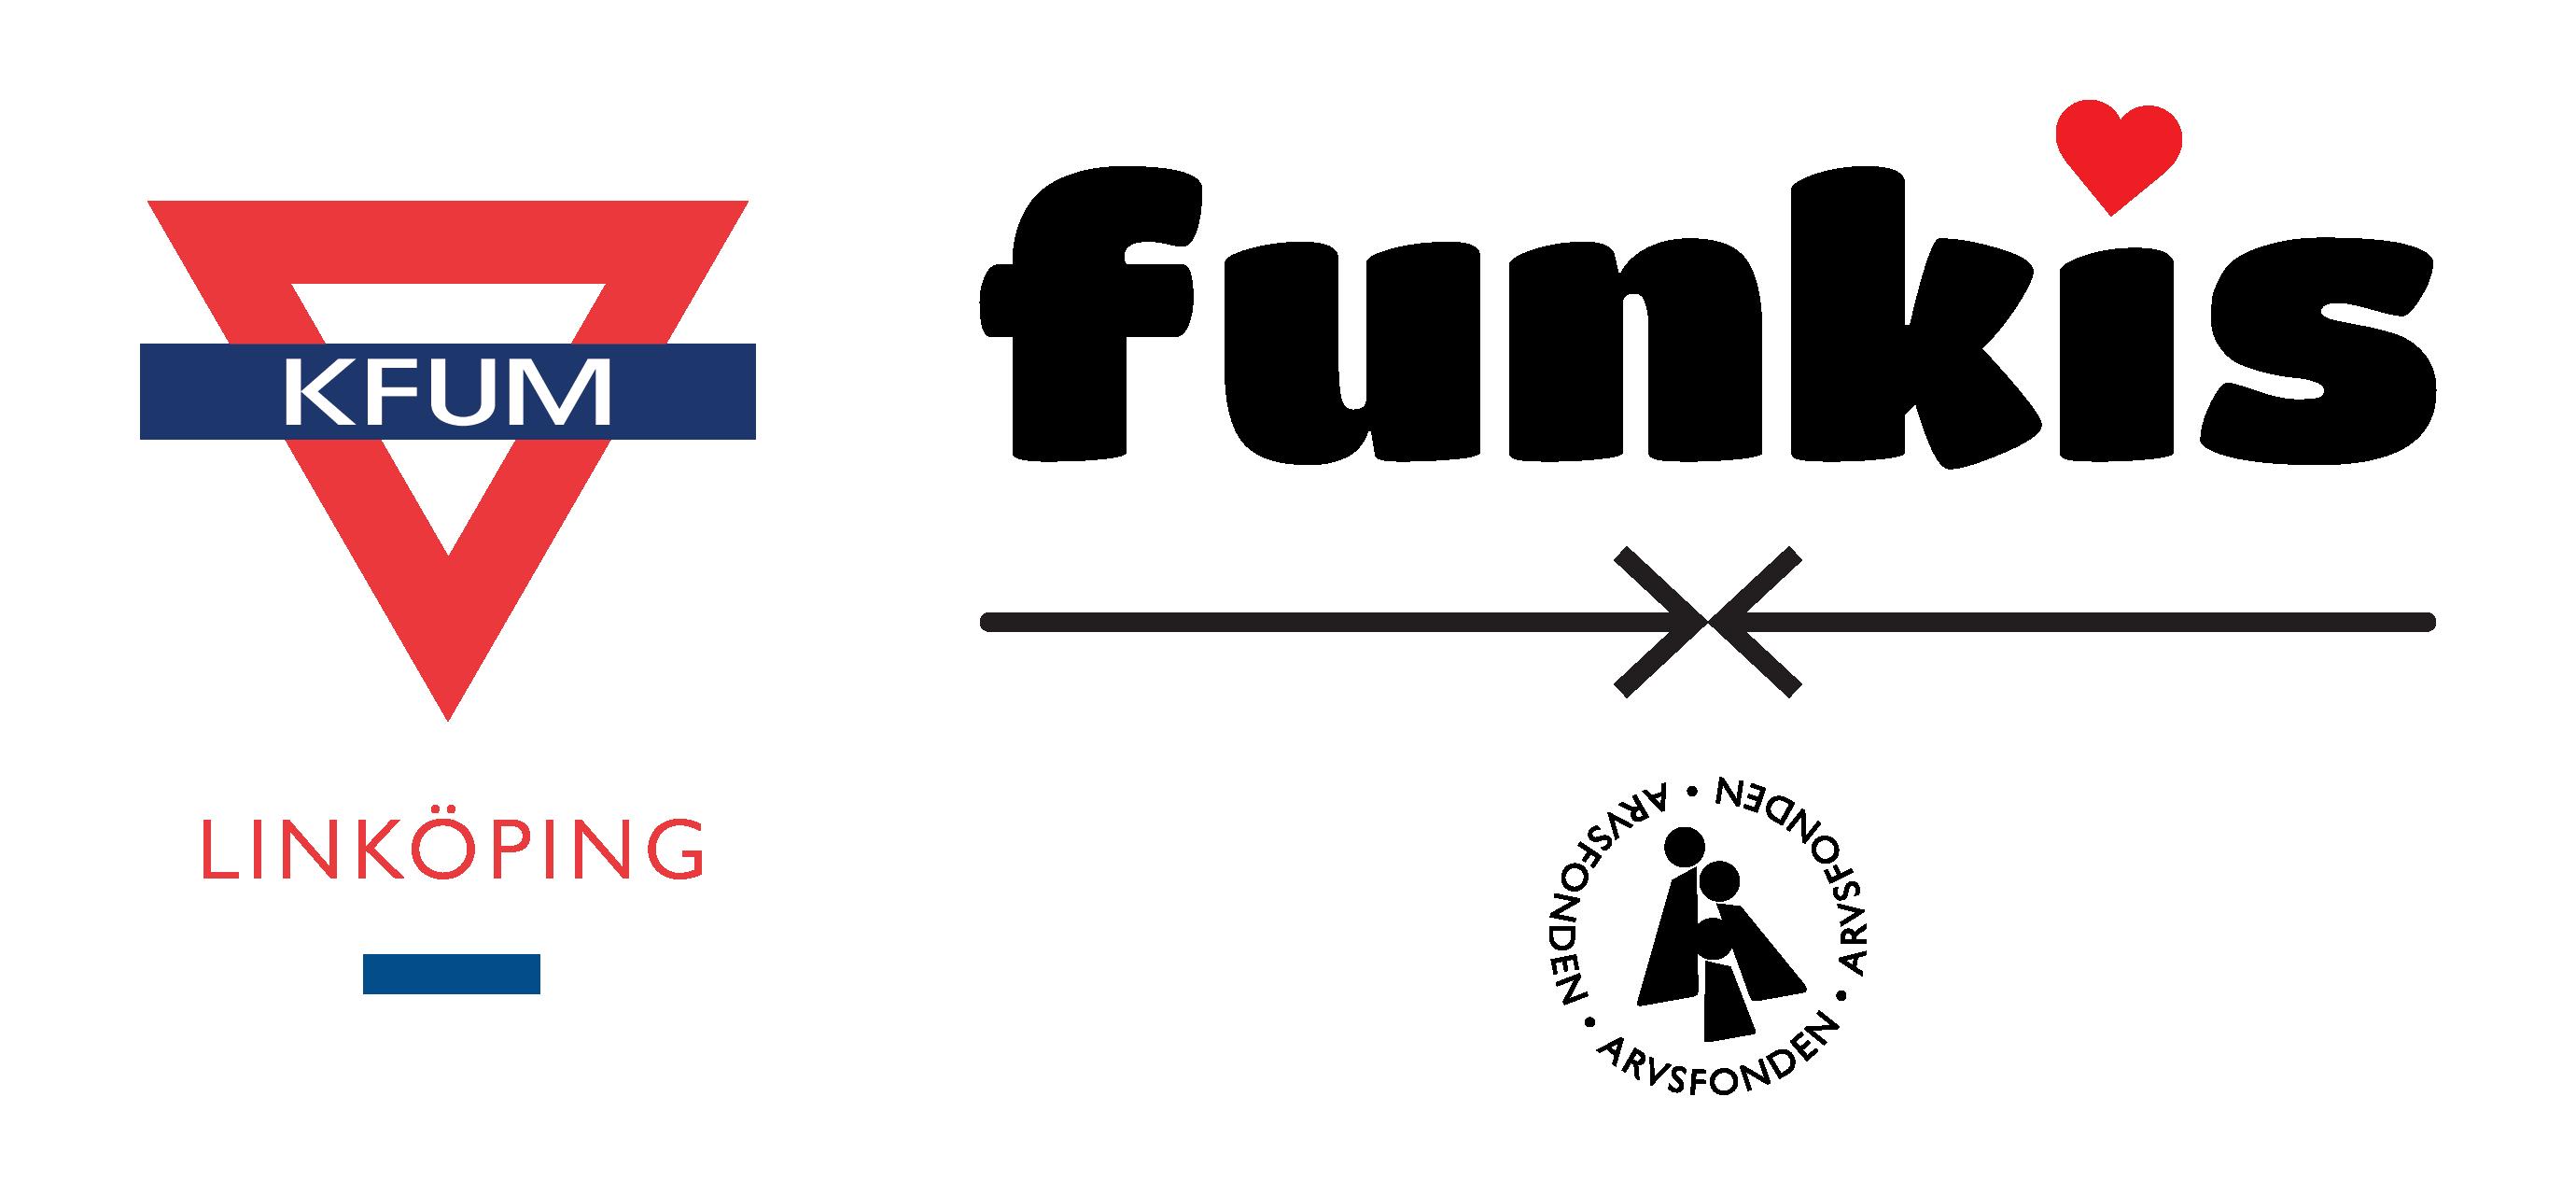 kfum-funkis-logo-partners@2x.png